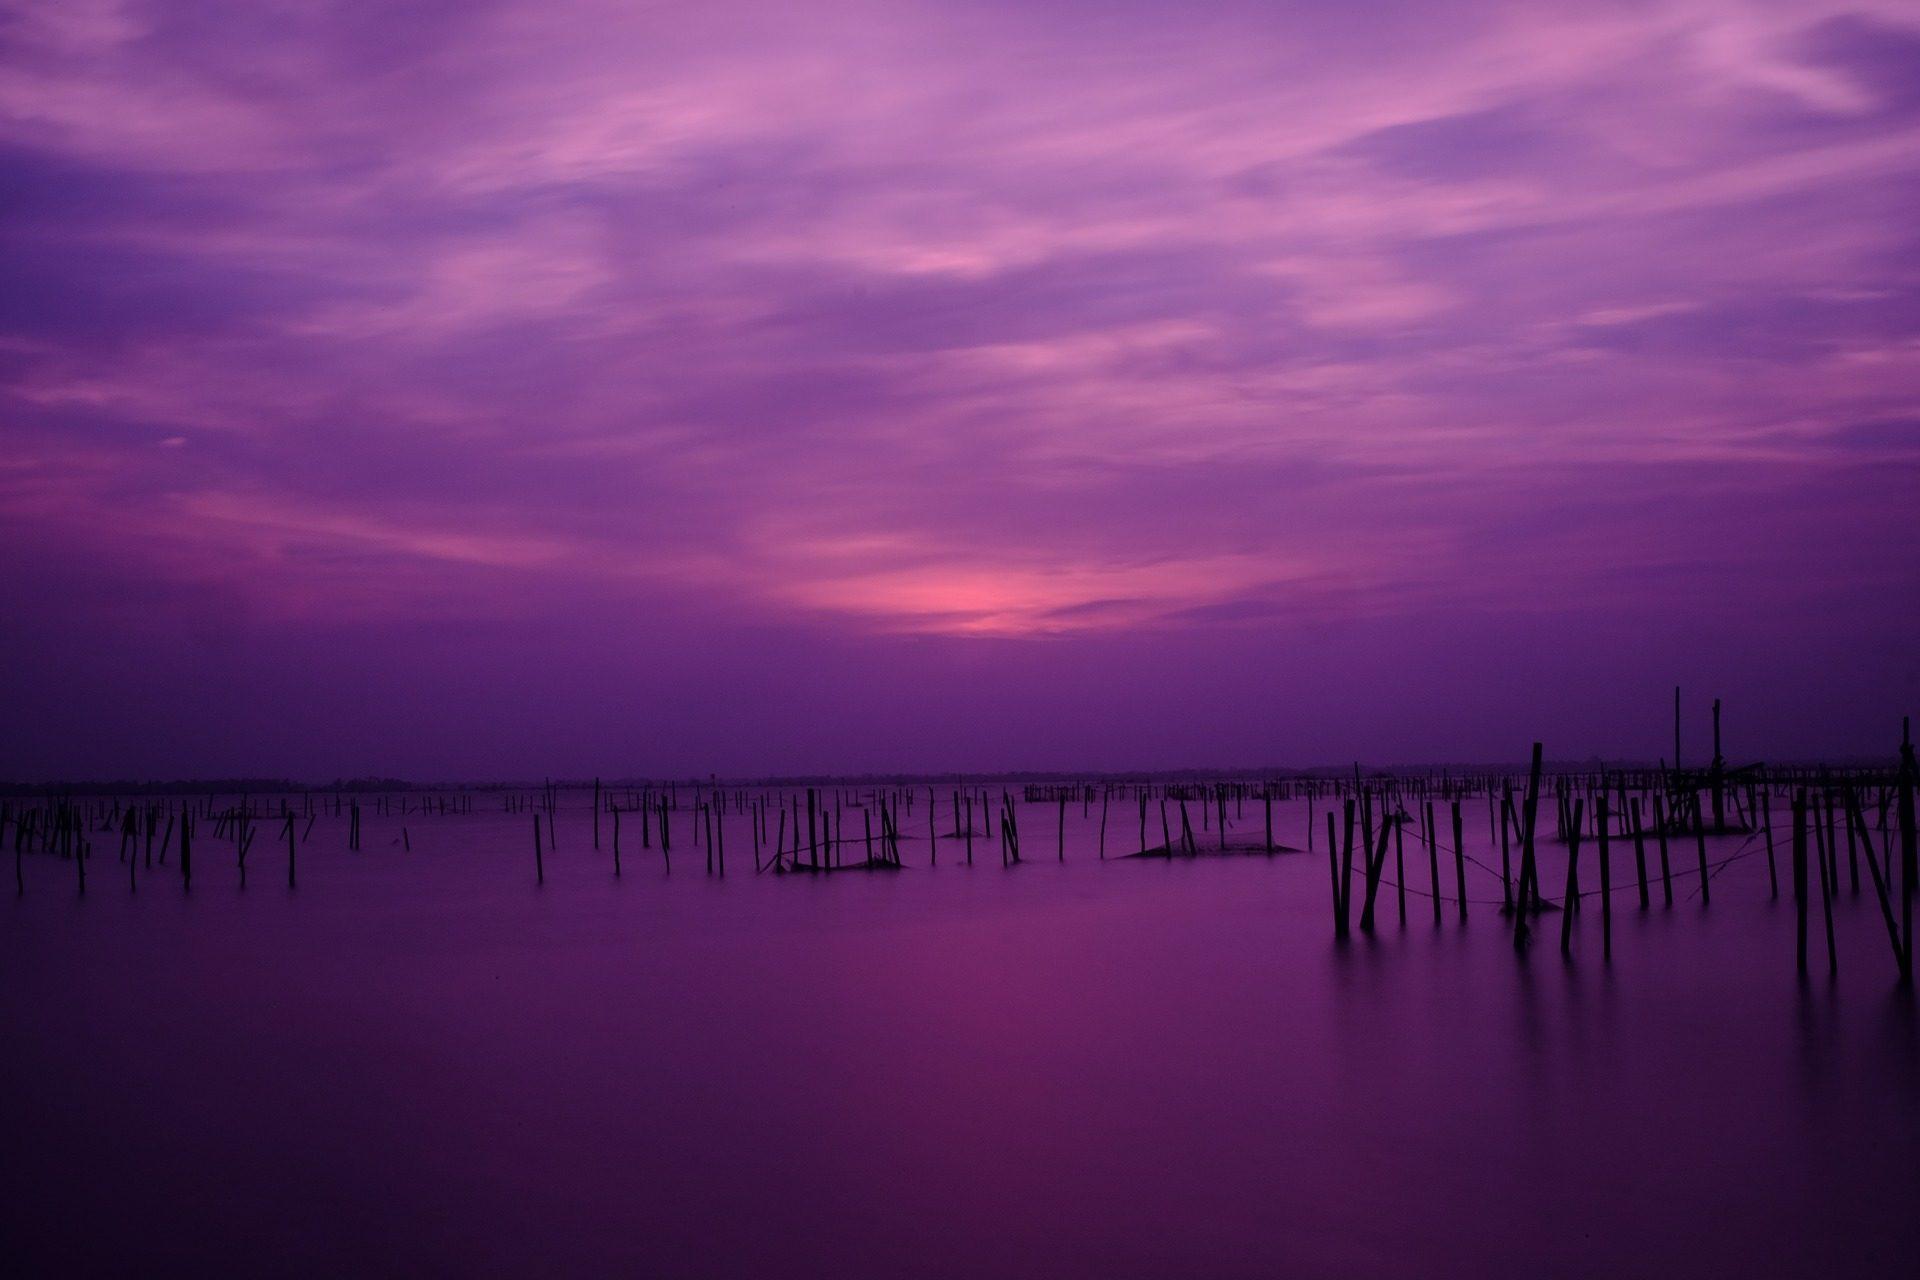 Sonnenuntergang, Himmel, Lila, Laguna, TAM giang, Vietnam - Wallpaper HD - Prof.-falken.com